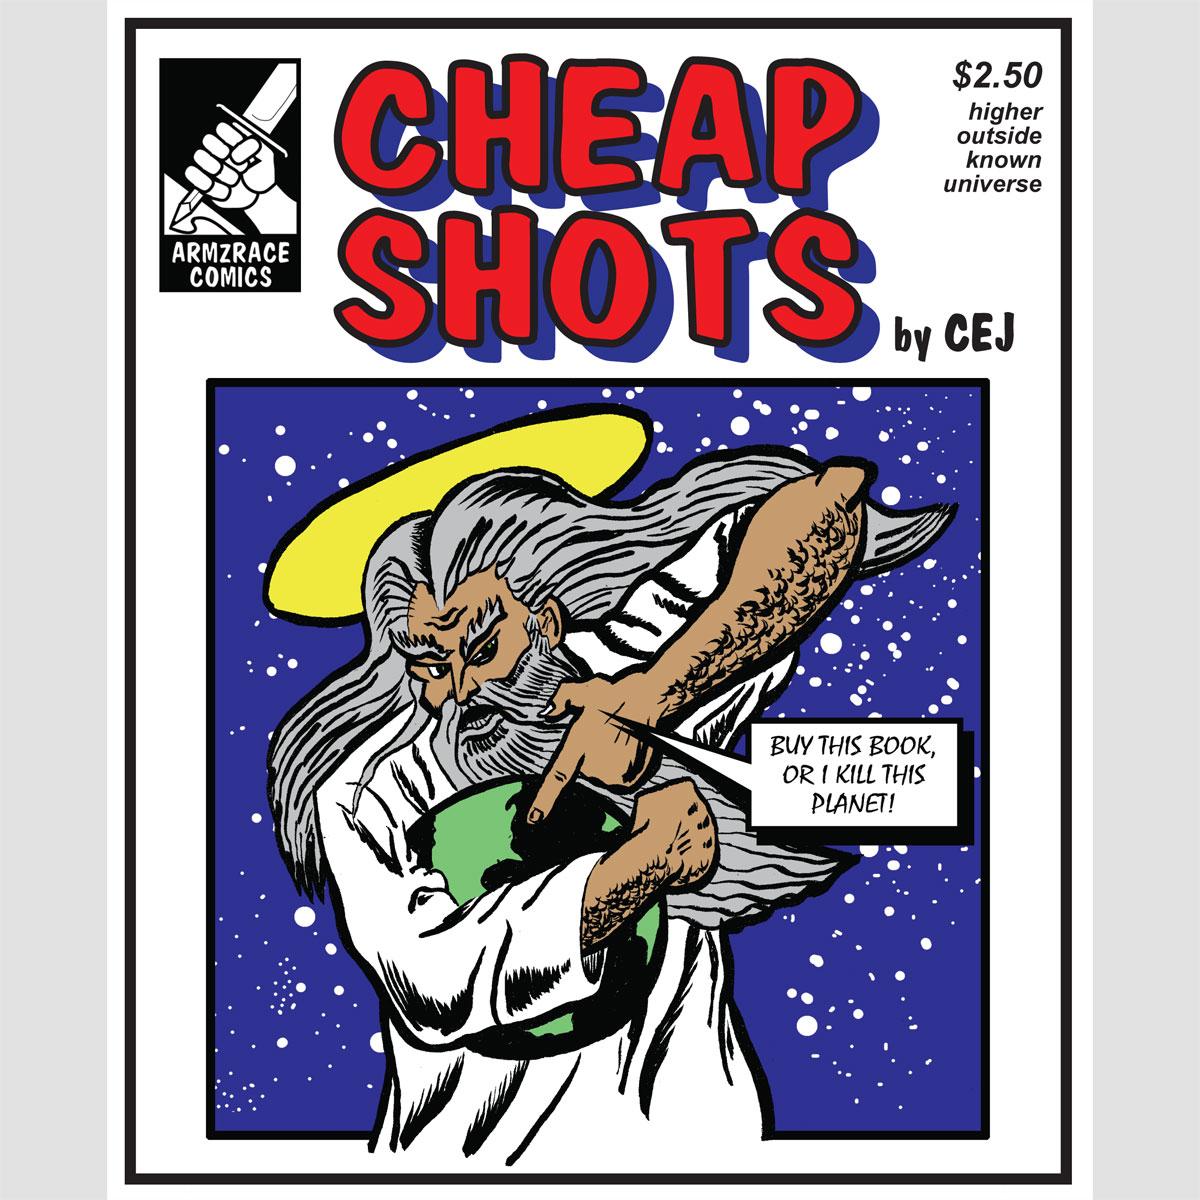 CheapShots-1-Cover-Square.jpg